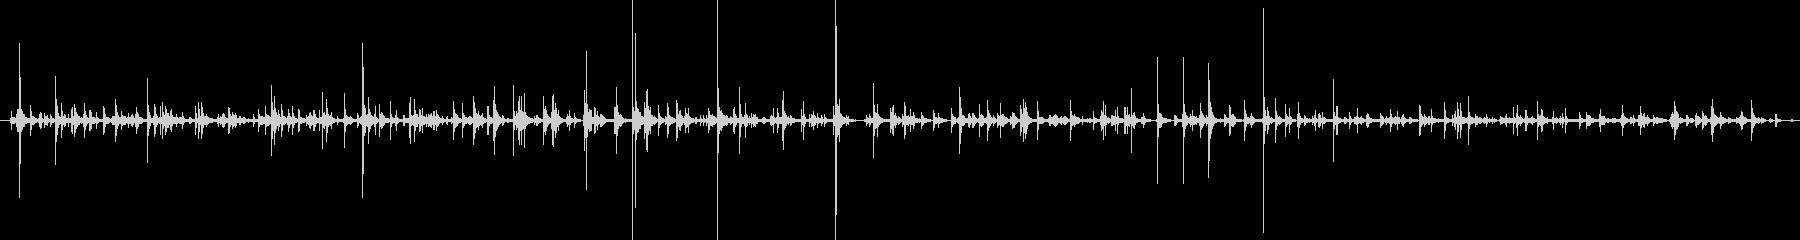 TAP 群集チェストヒット01の未再生の波形